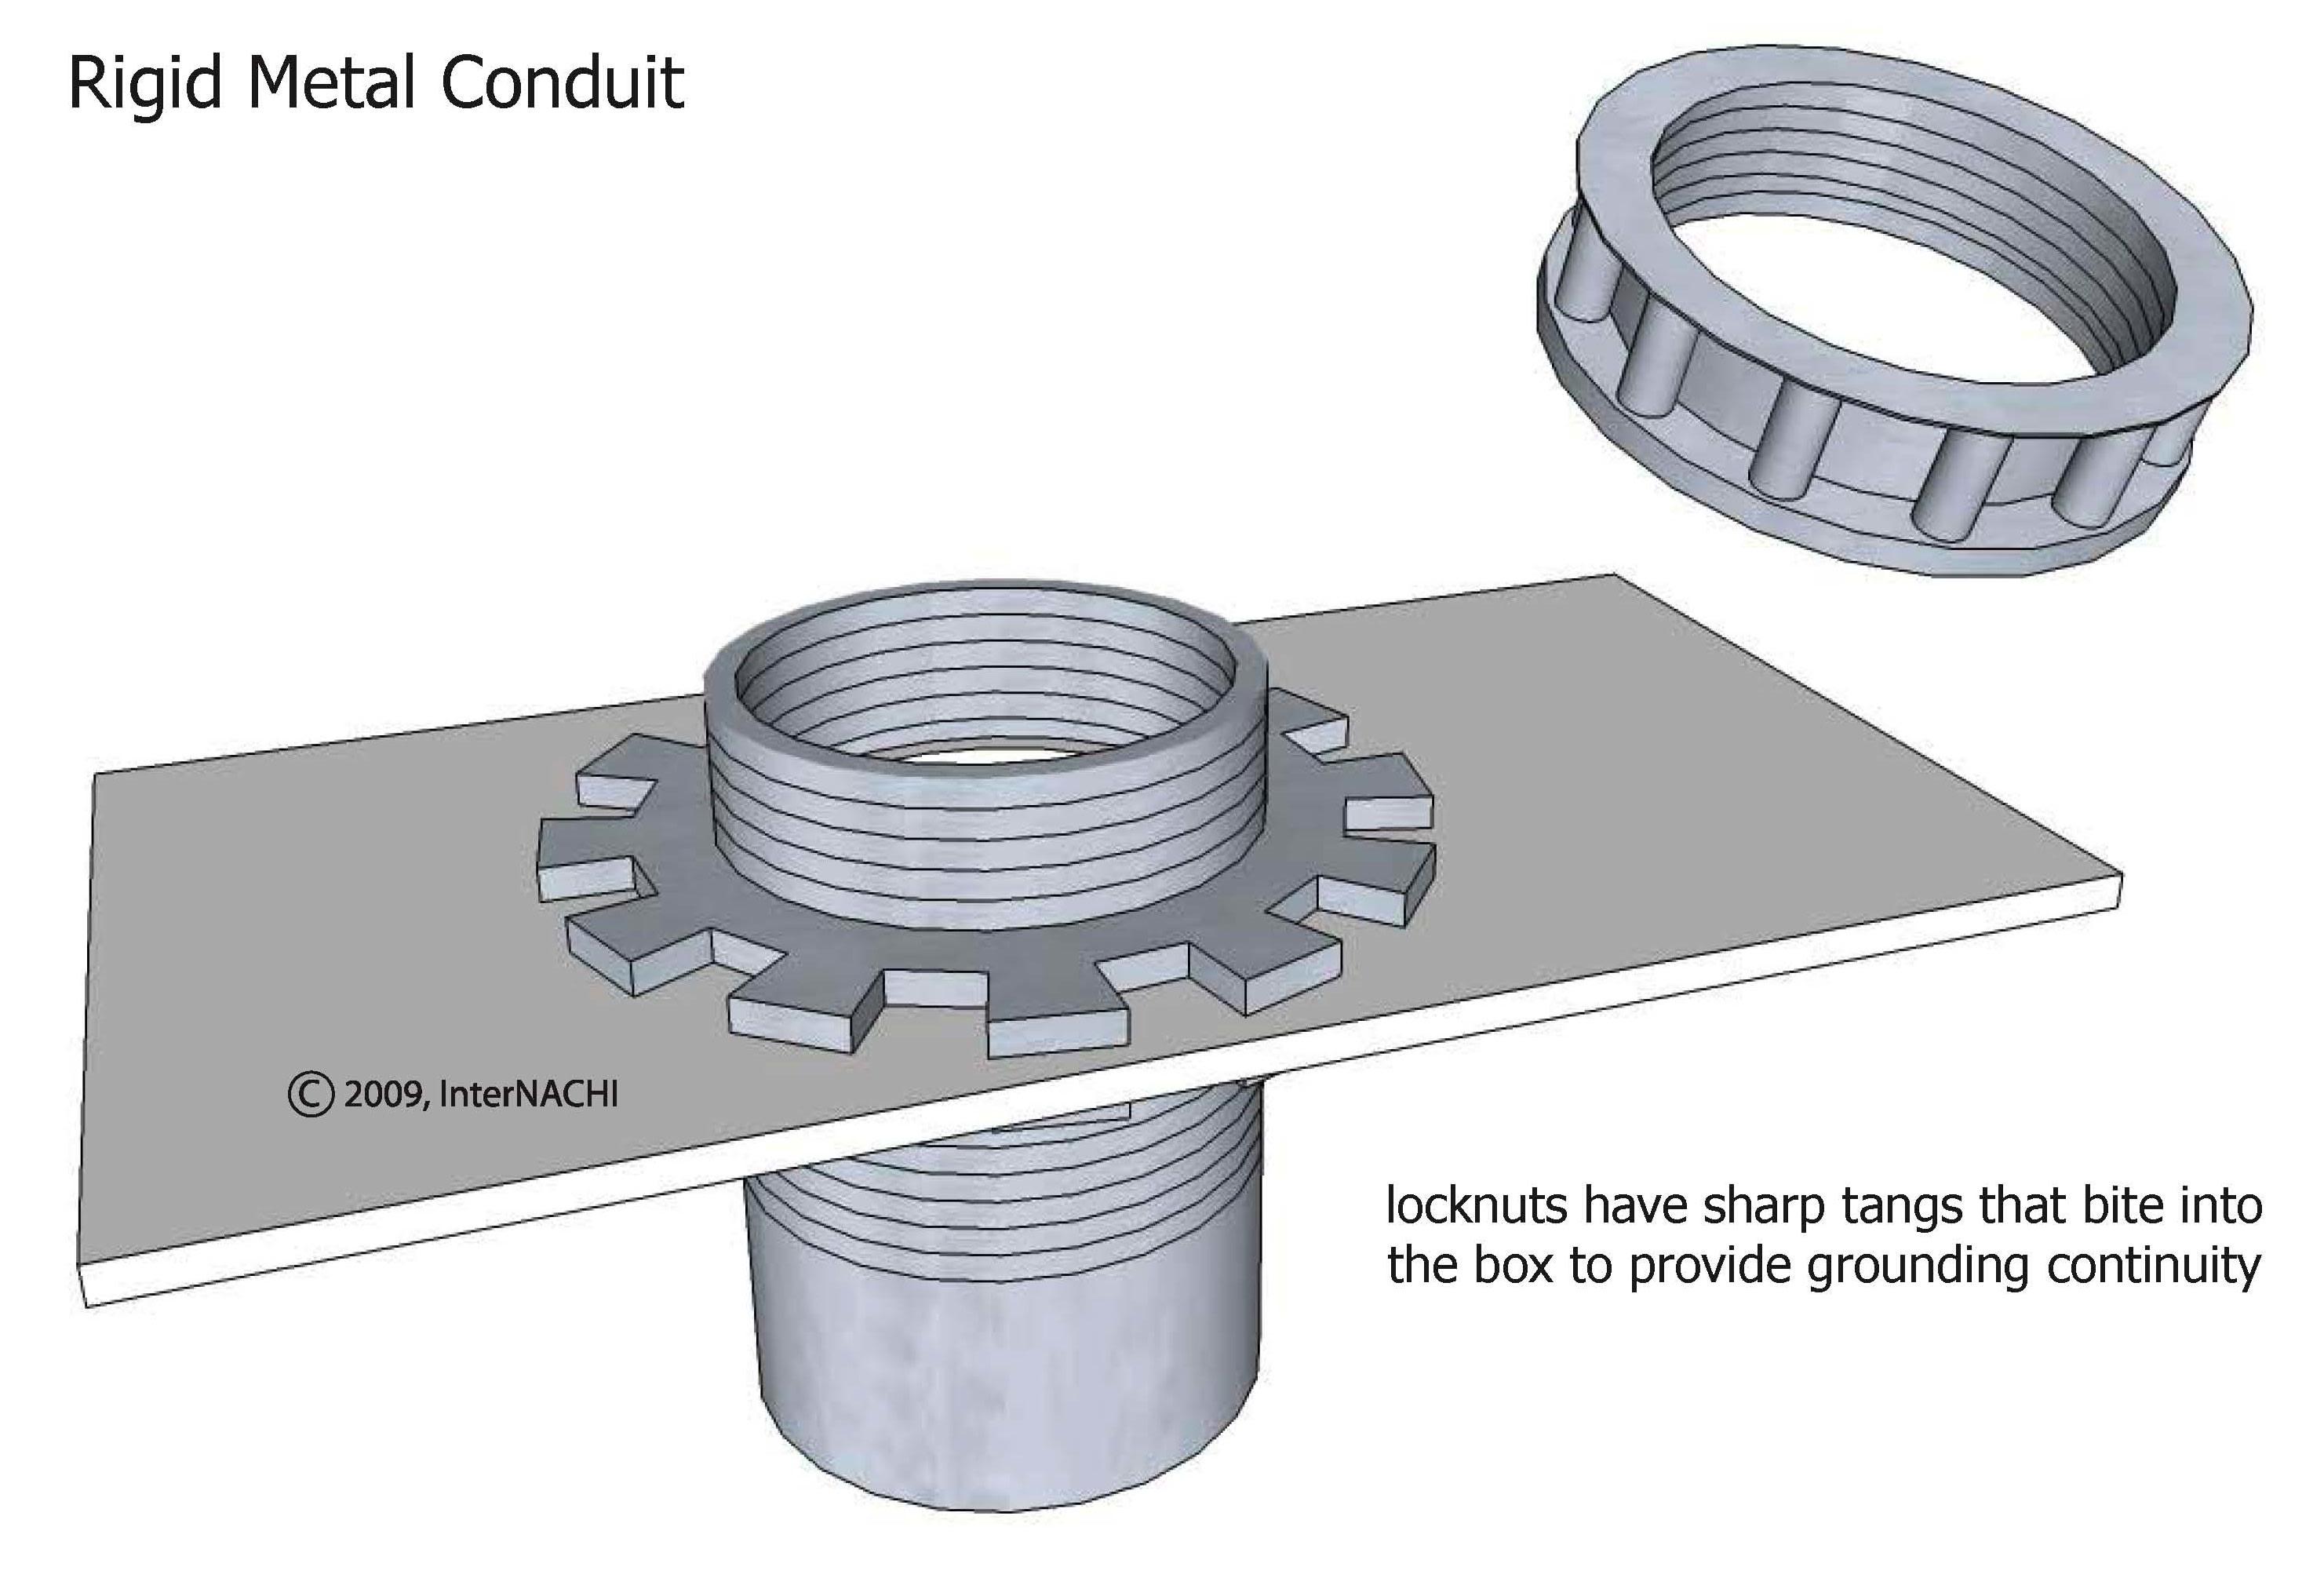 Rigid metal conduit.